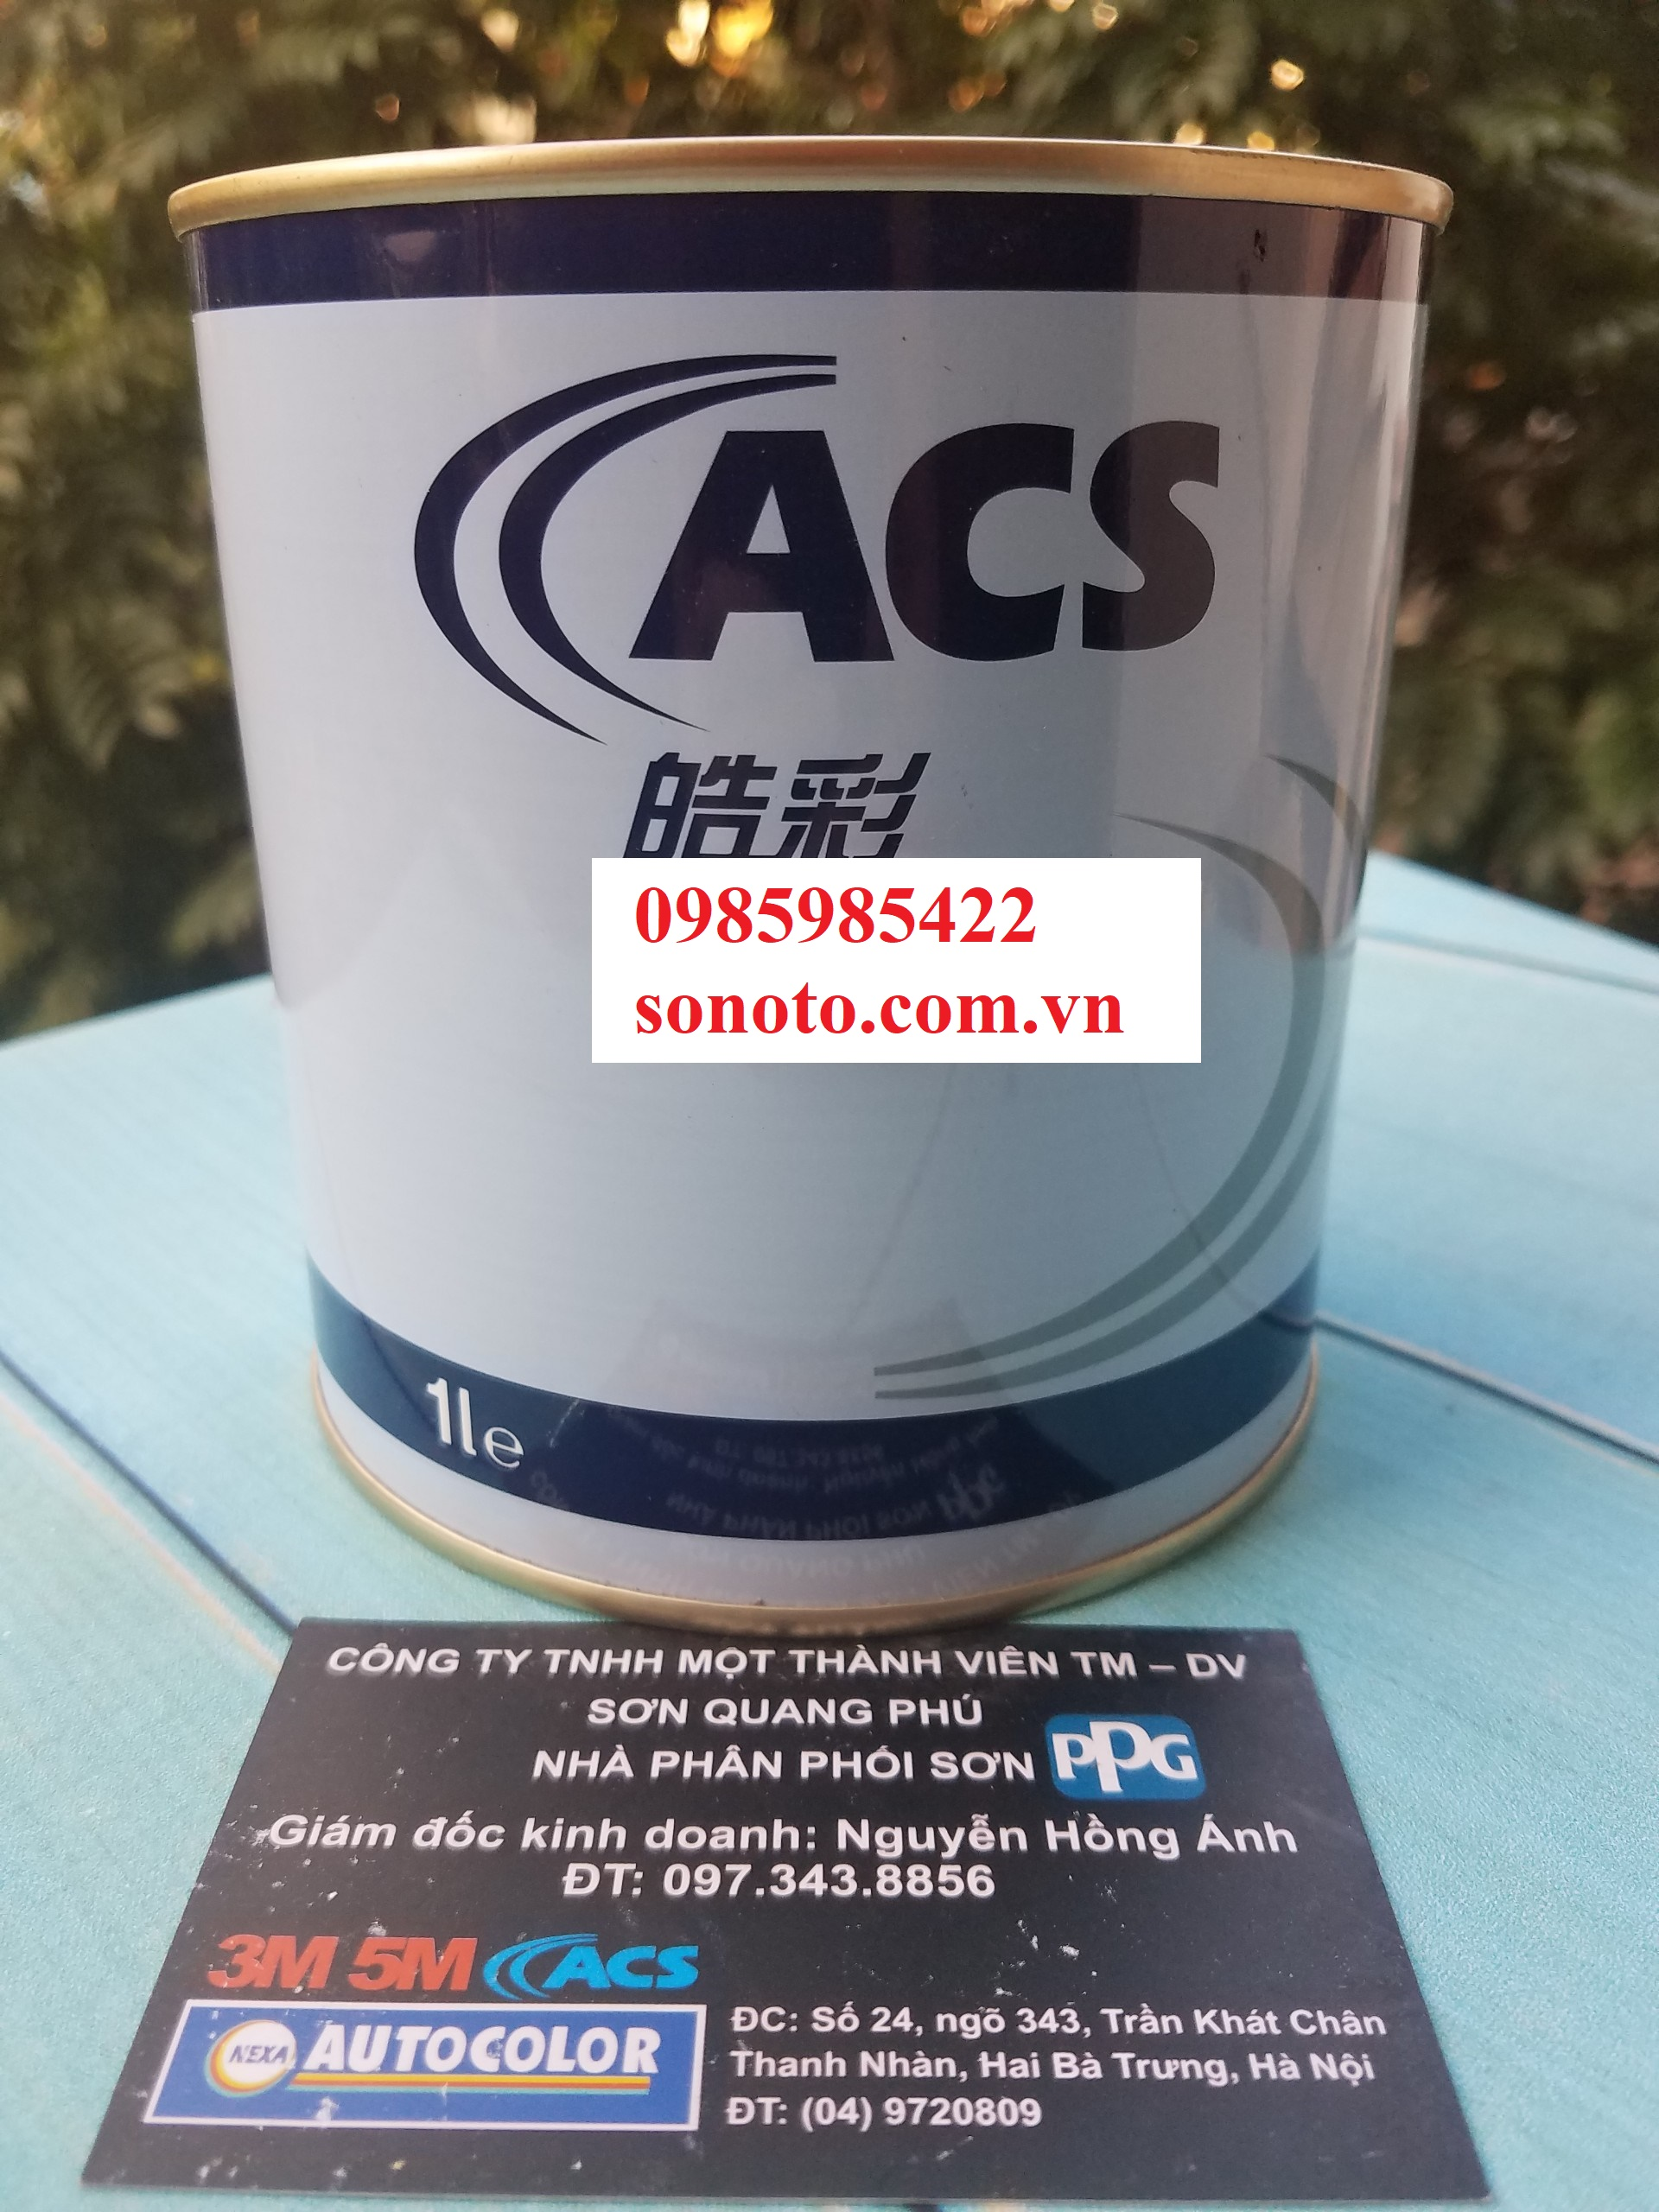 p549-044-son-goc-2k-mau-vang-nhat-1-lit-acs